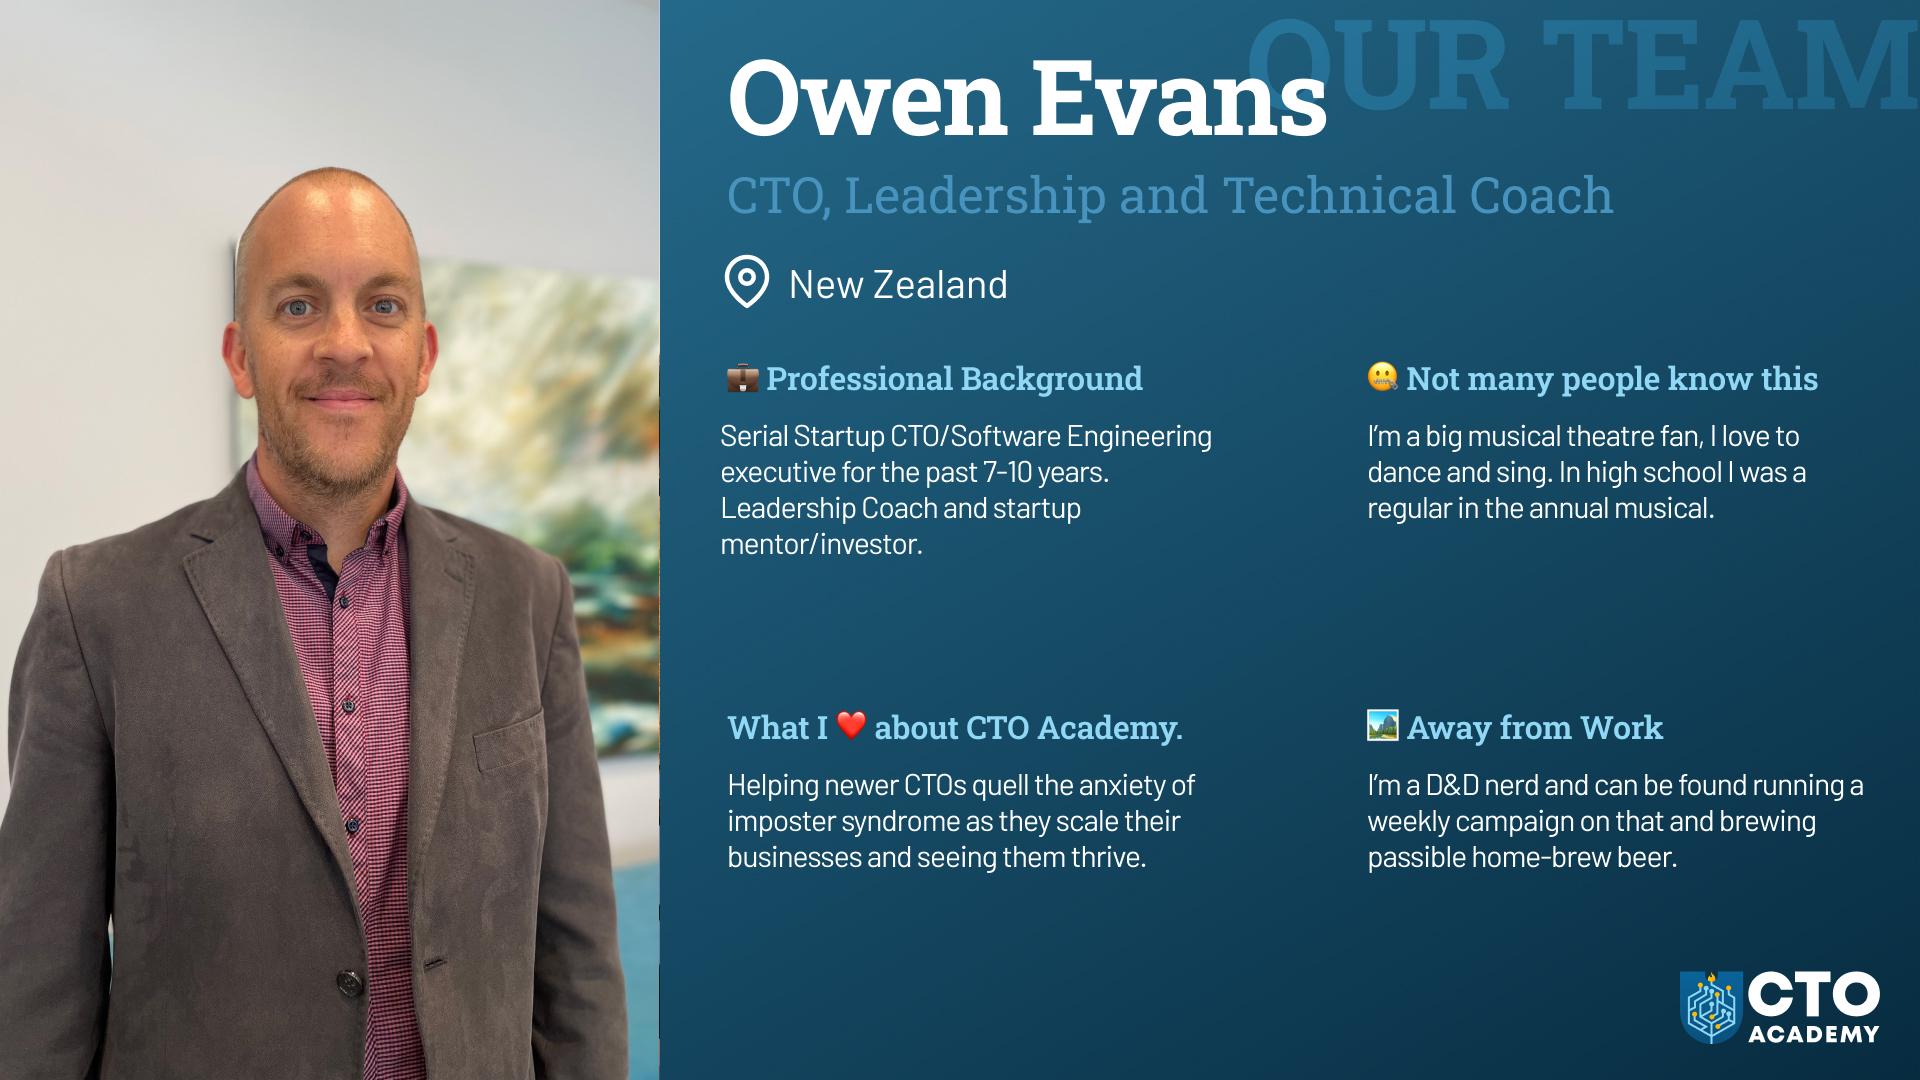 Owen Evans leadership coach